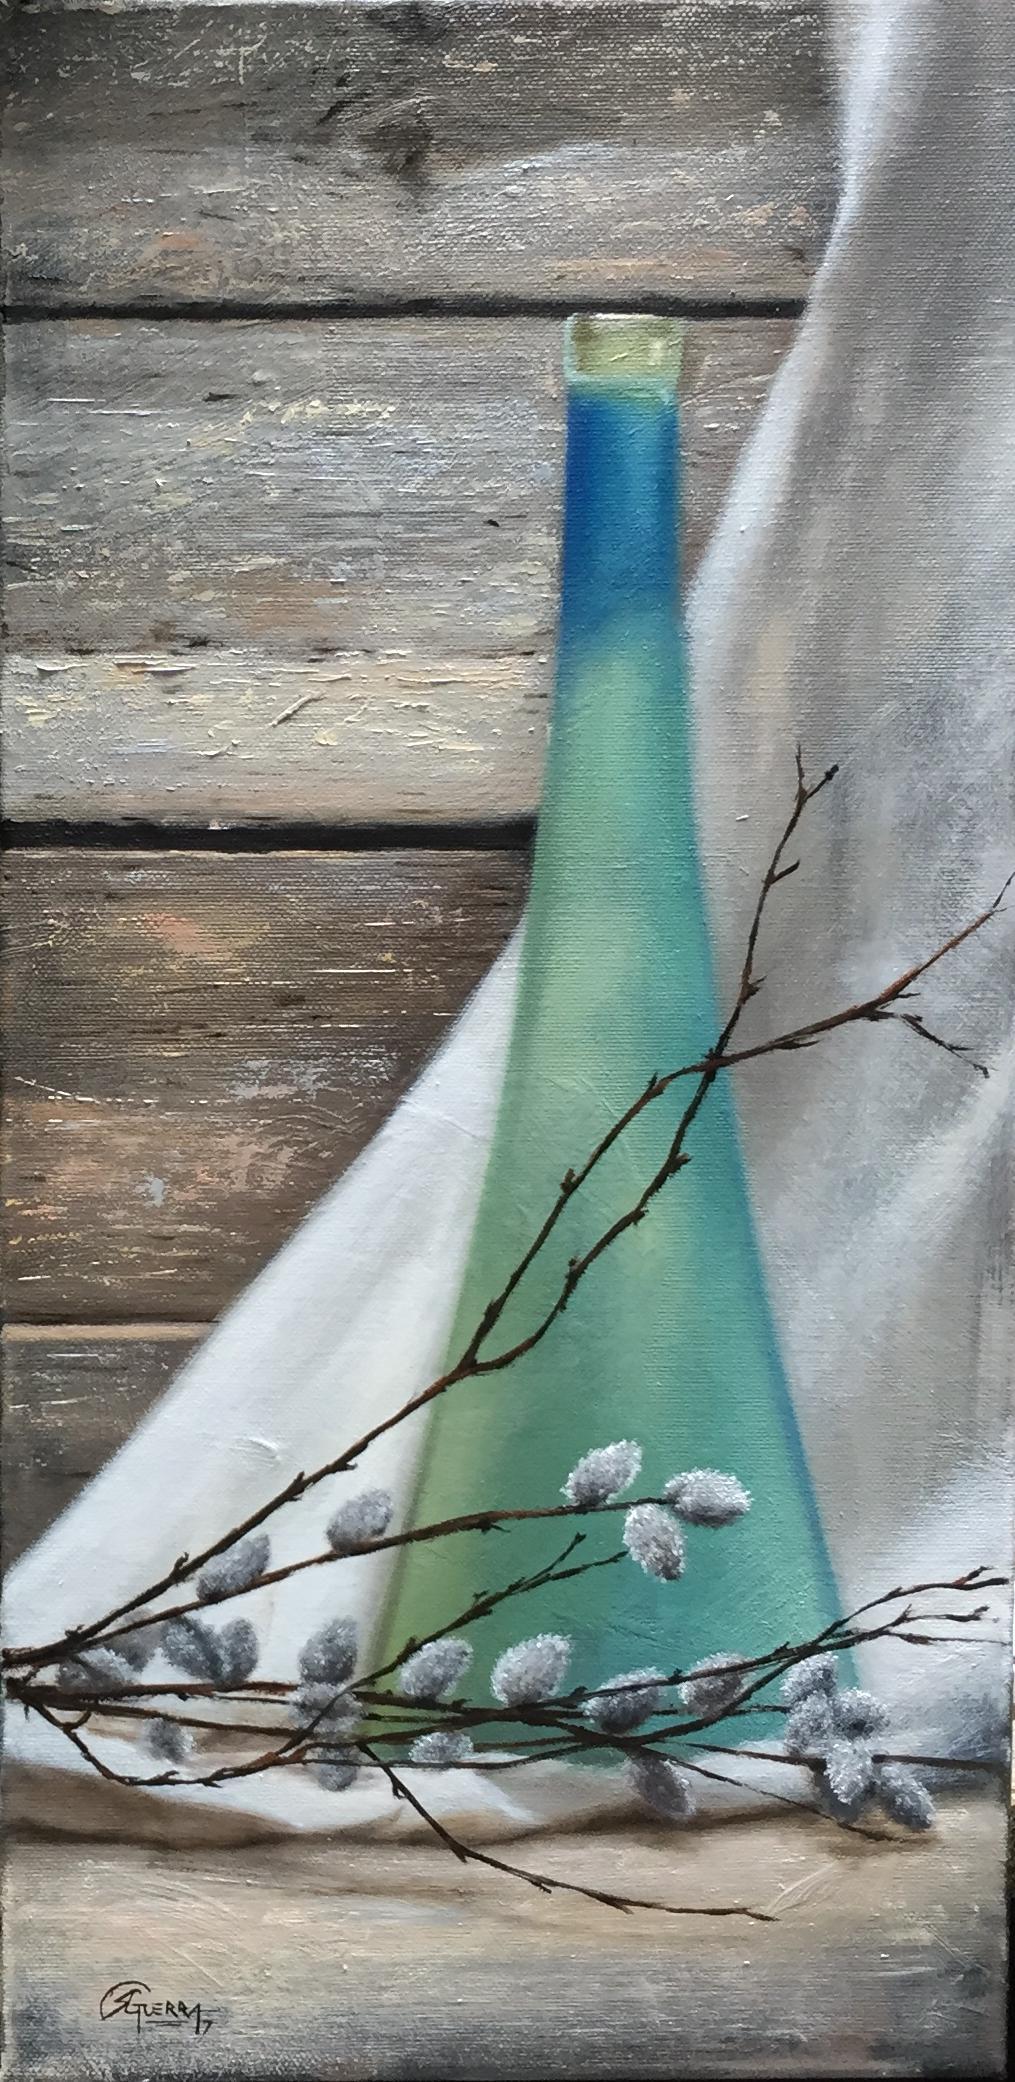 Turquoise Vase, Rafael Guerra Painting